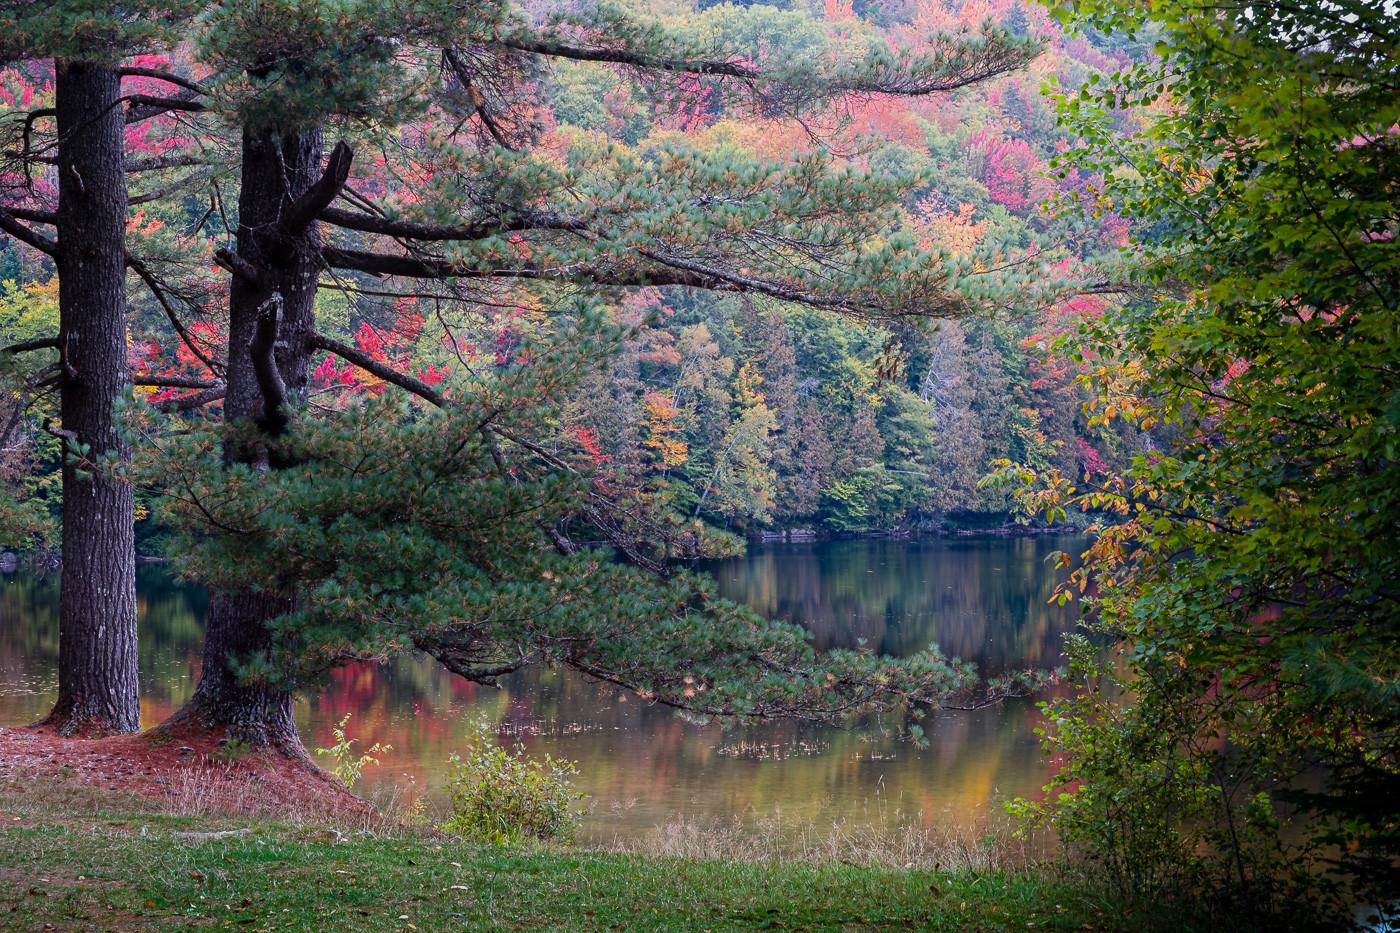 Eighth Lake Campground